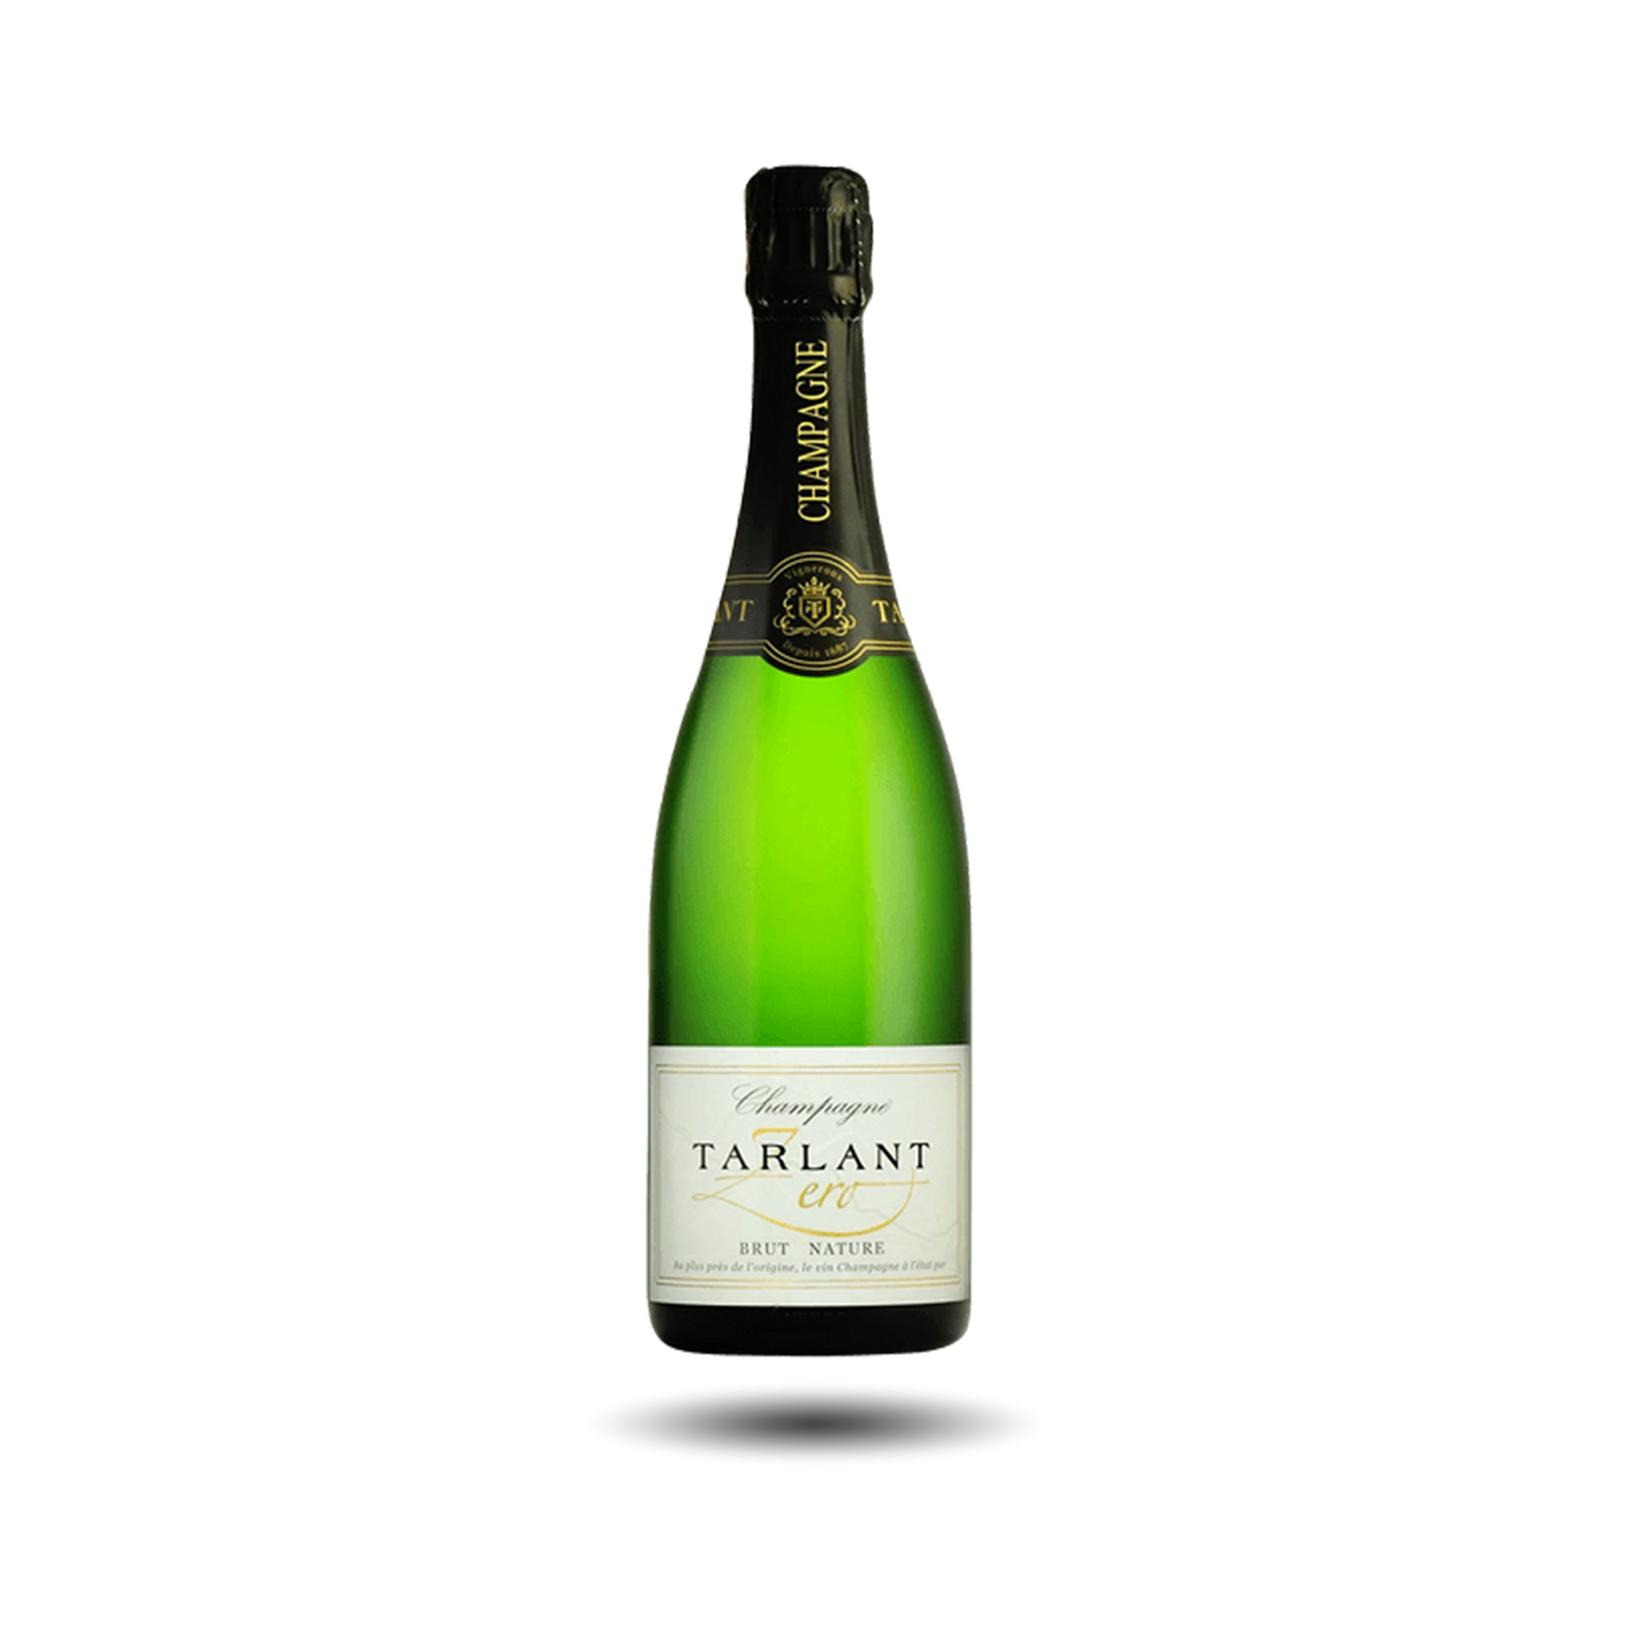 Champagne Tarlant Zero - Brut, Nature